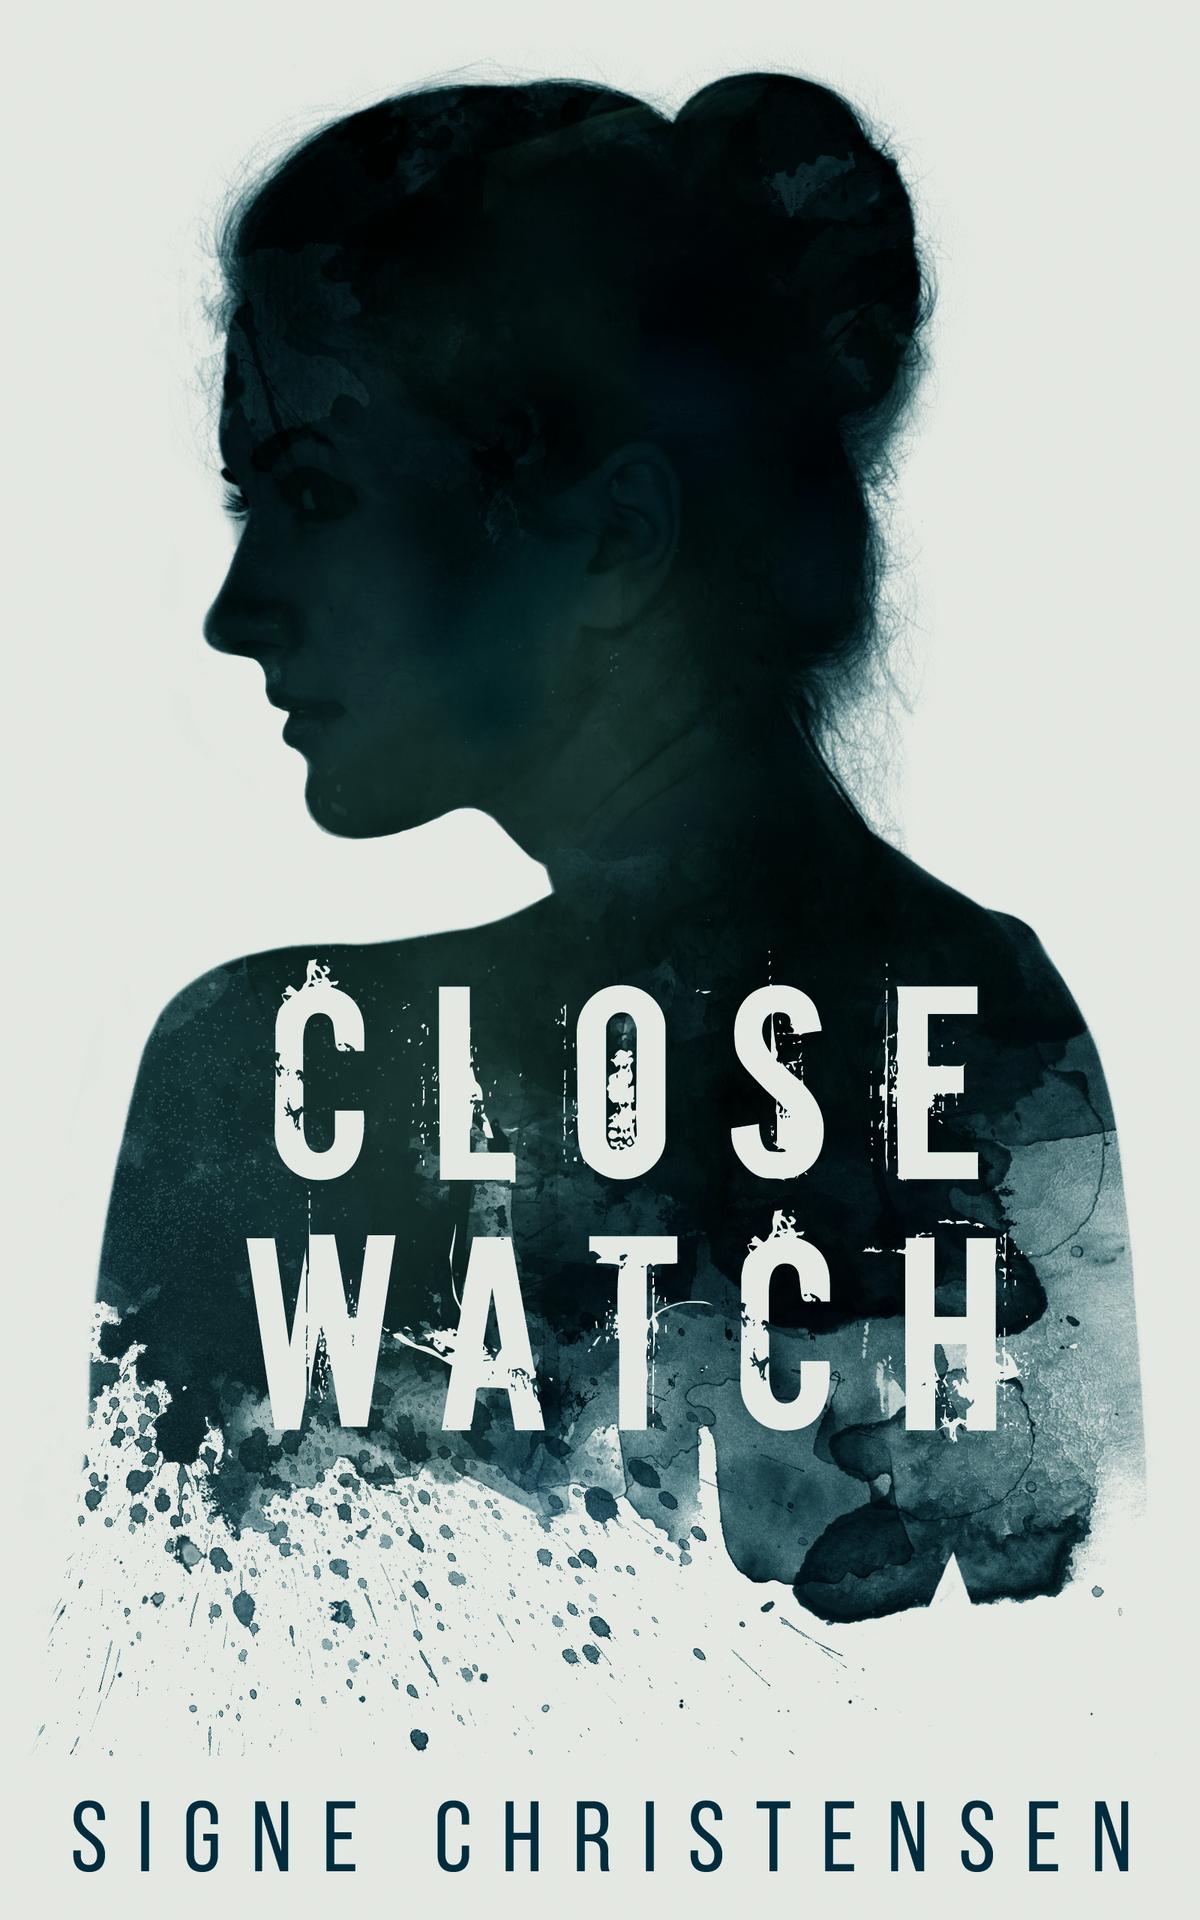 Ebook cover for psychological thriller about stalking.